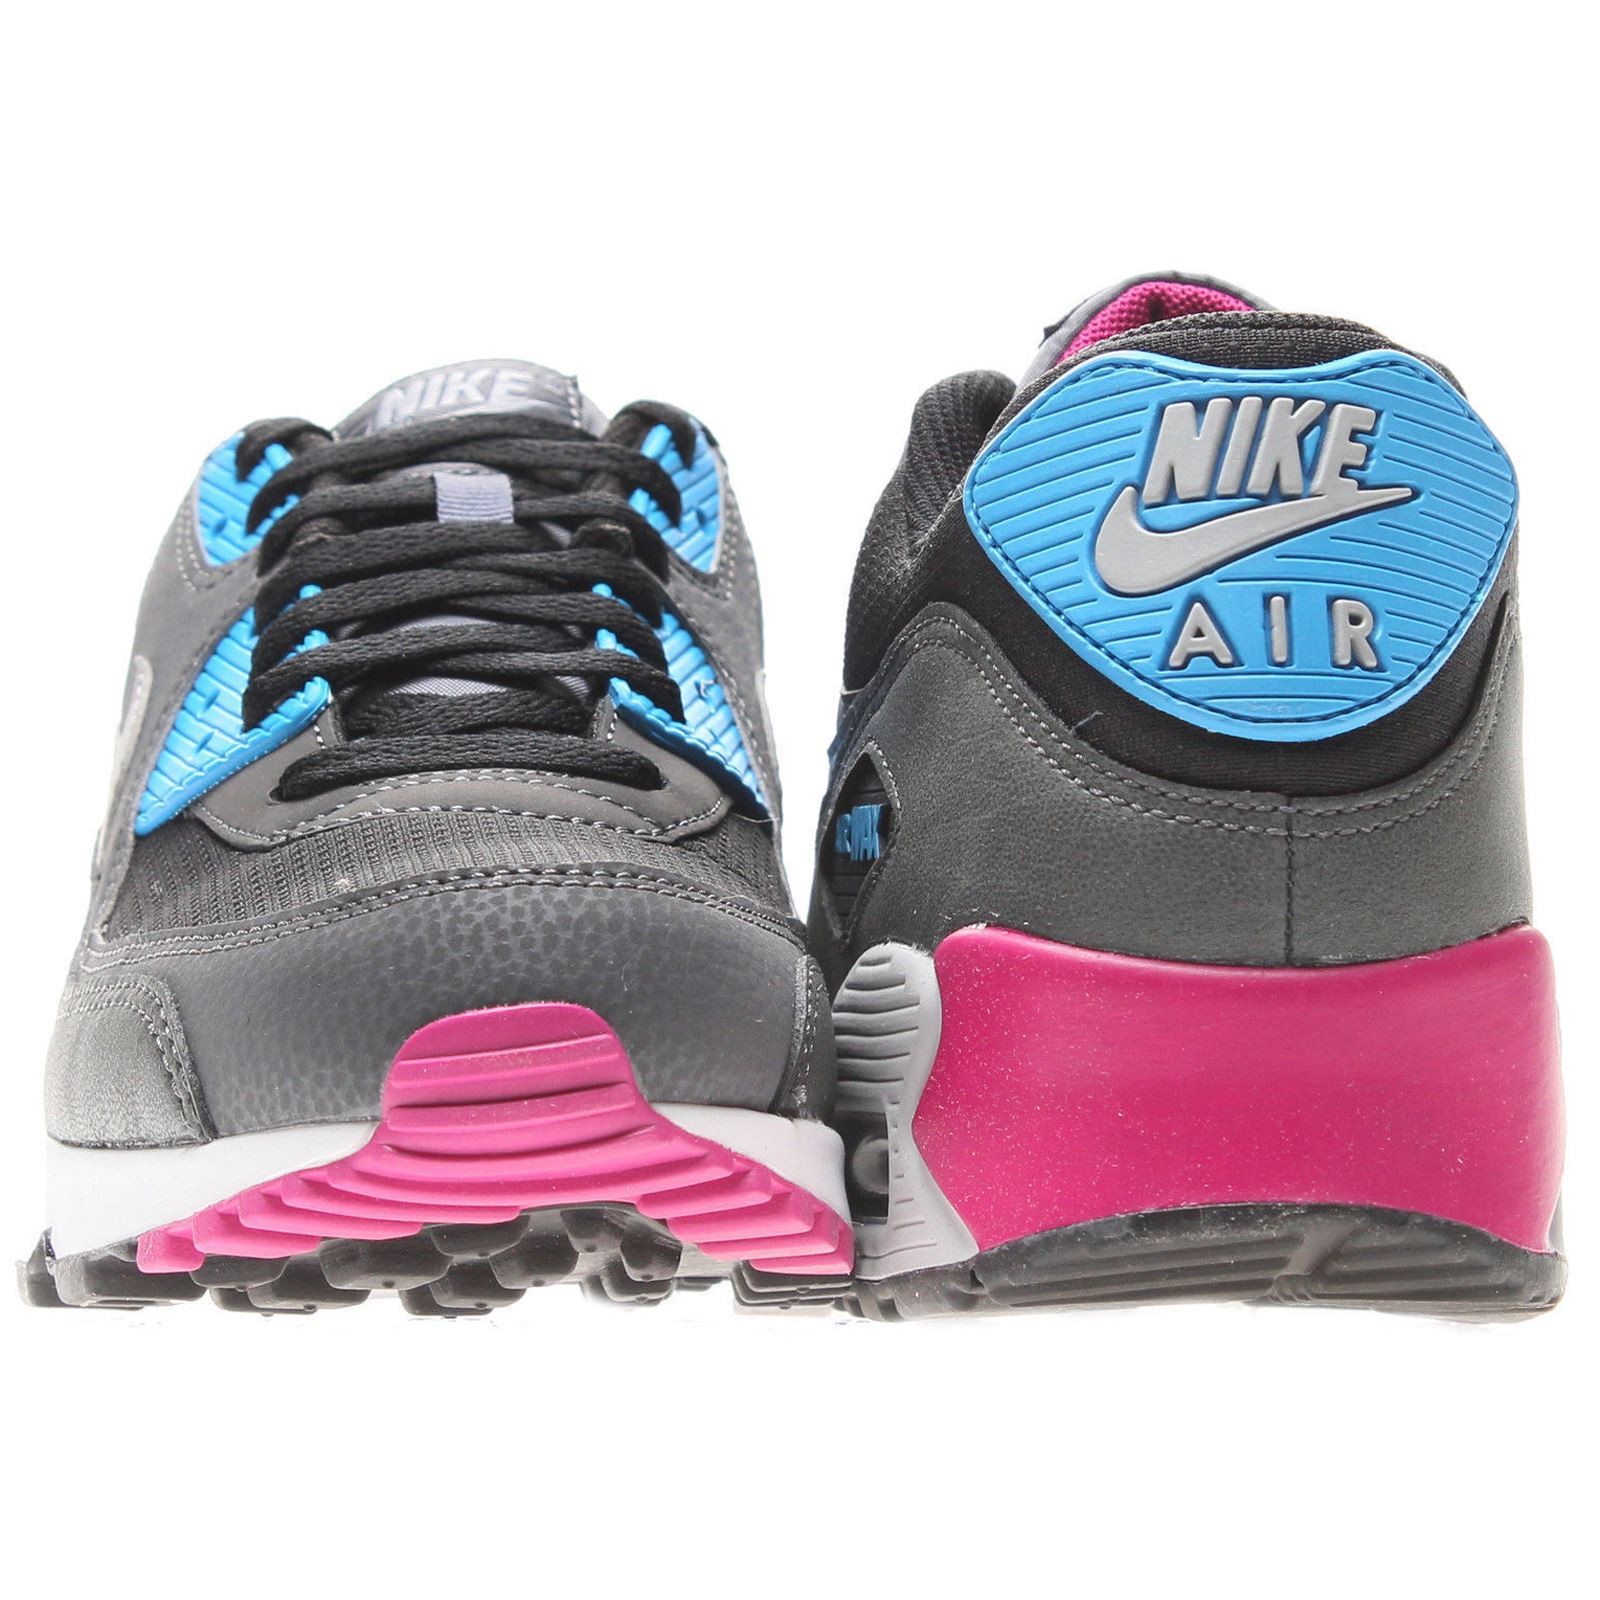 Nike Air Max Blanc Hommes 90 Enchère Ebay fMTr2R8H5